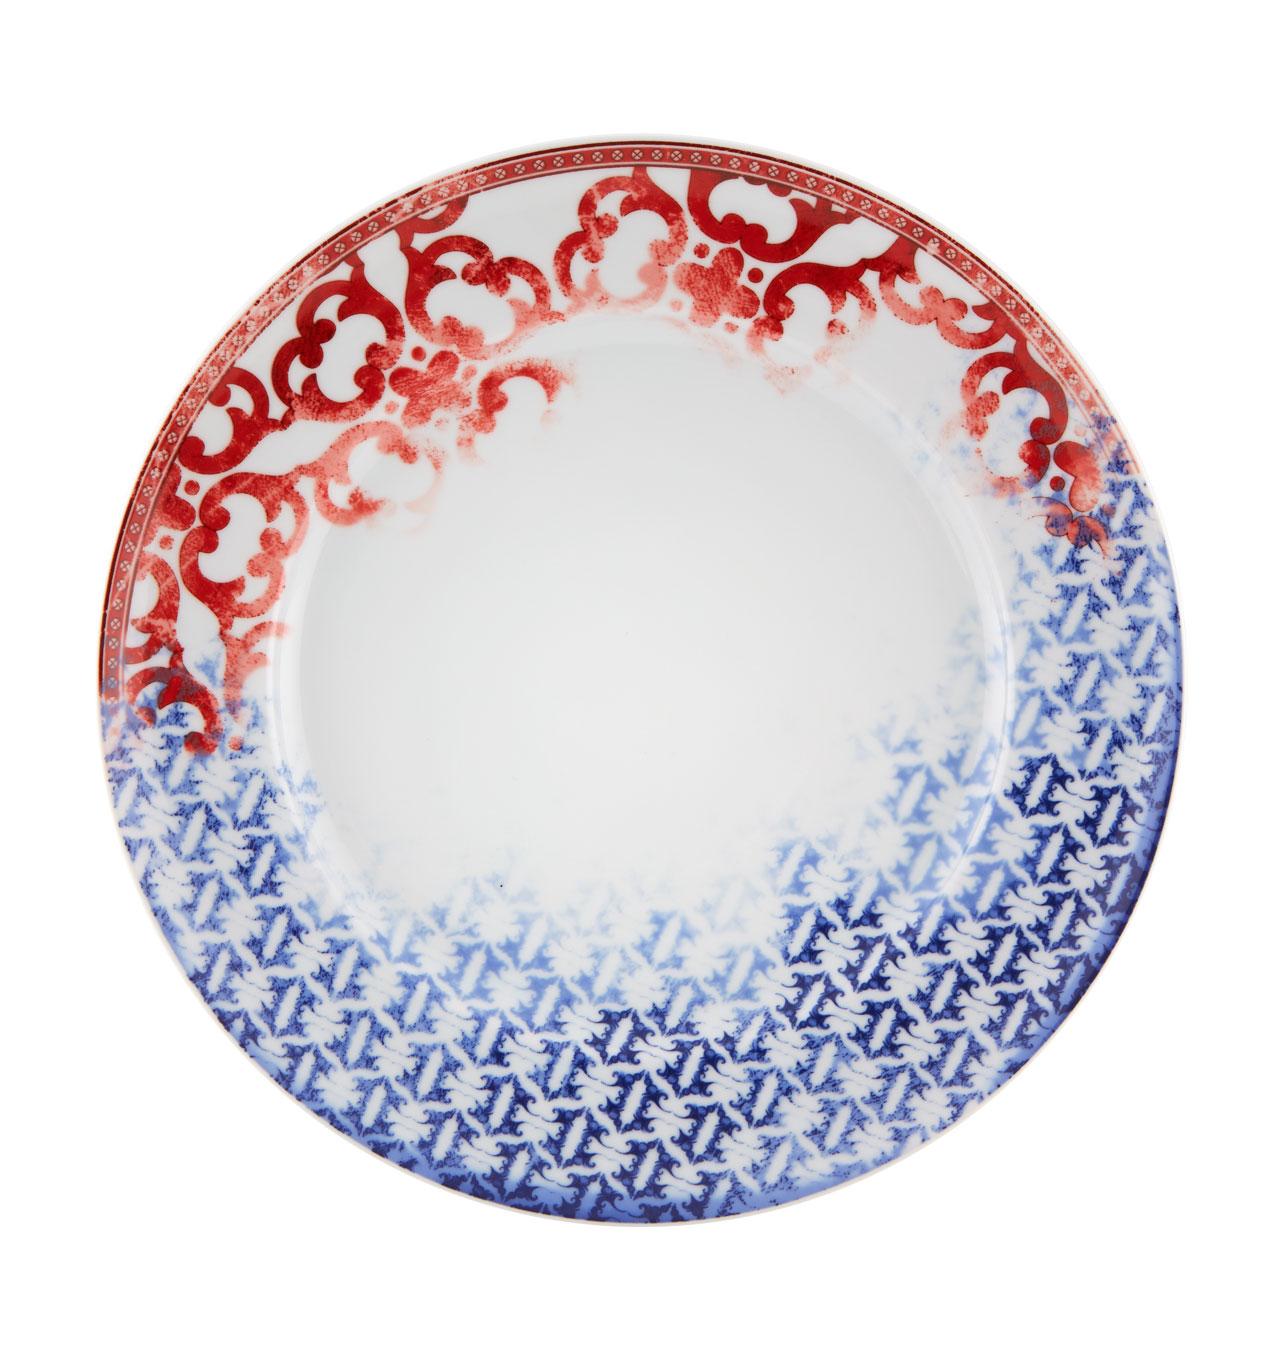 sc 1 st  Vista Alegre & Dinner Plate Timeless | Vista Alegre